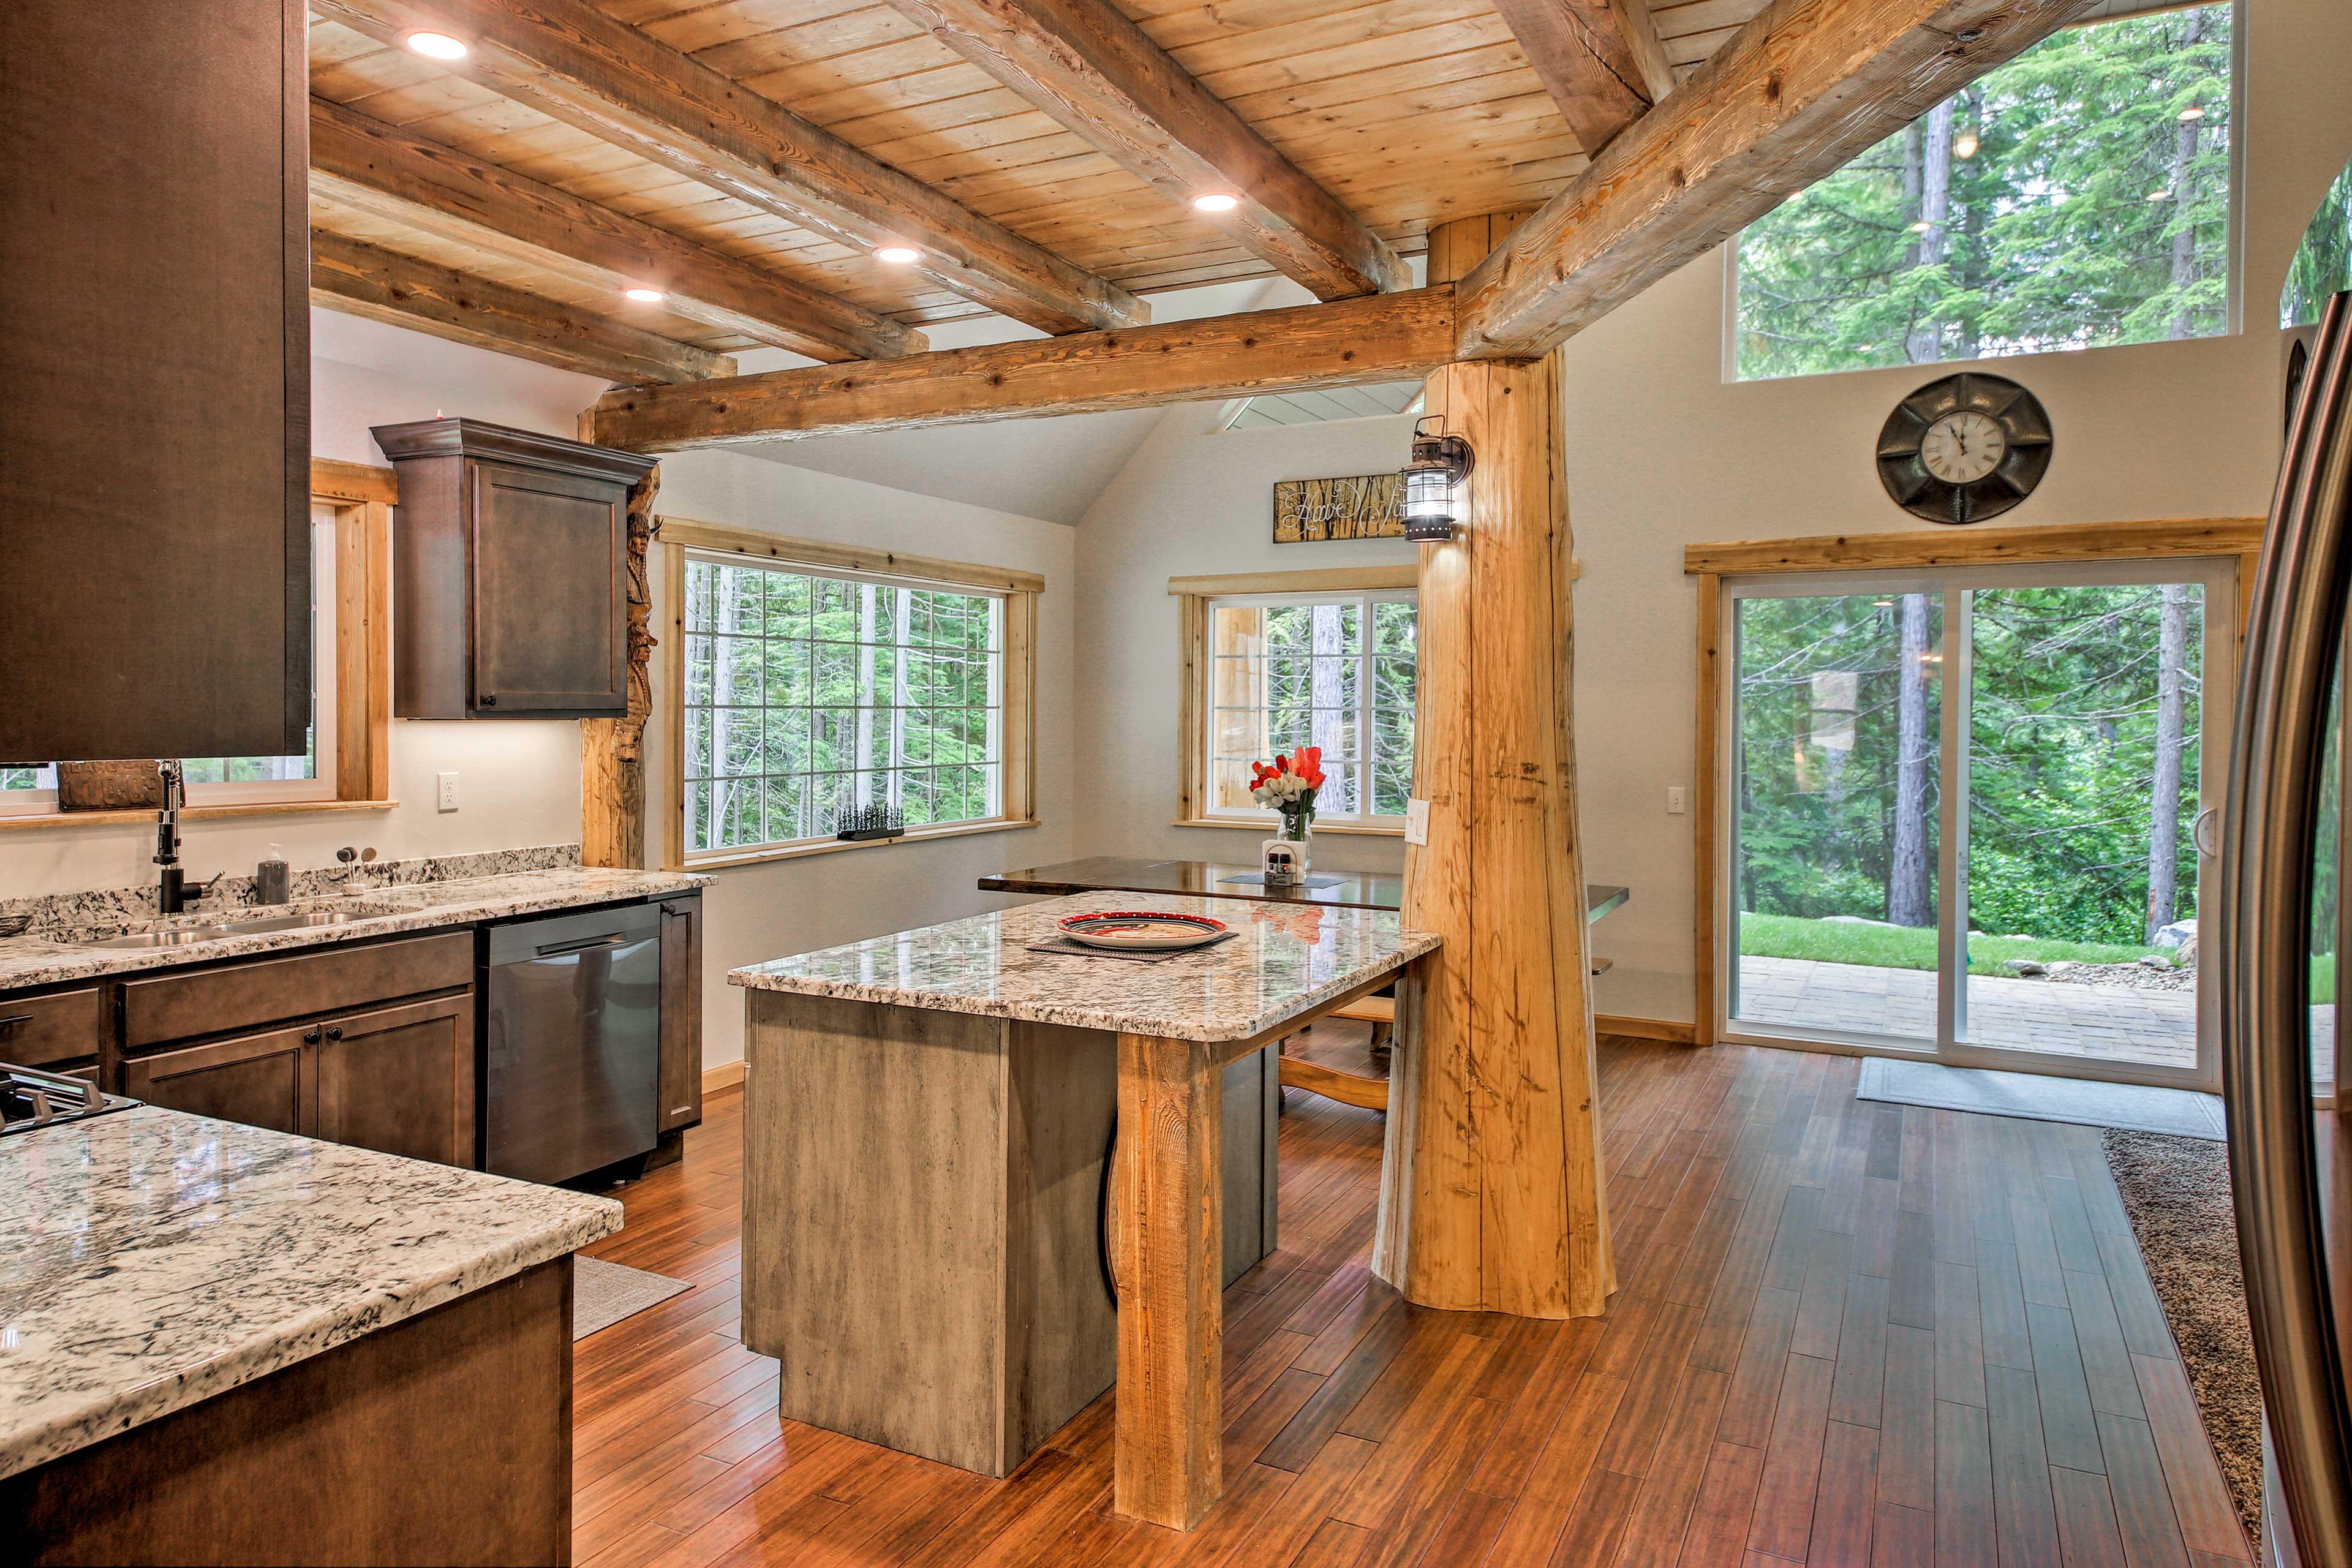 The kitchen boasts stylish granite countertops.